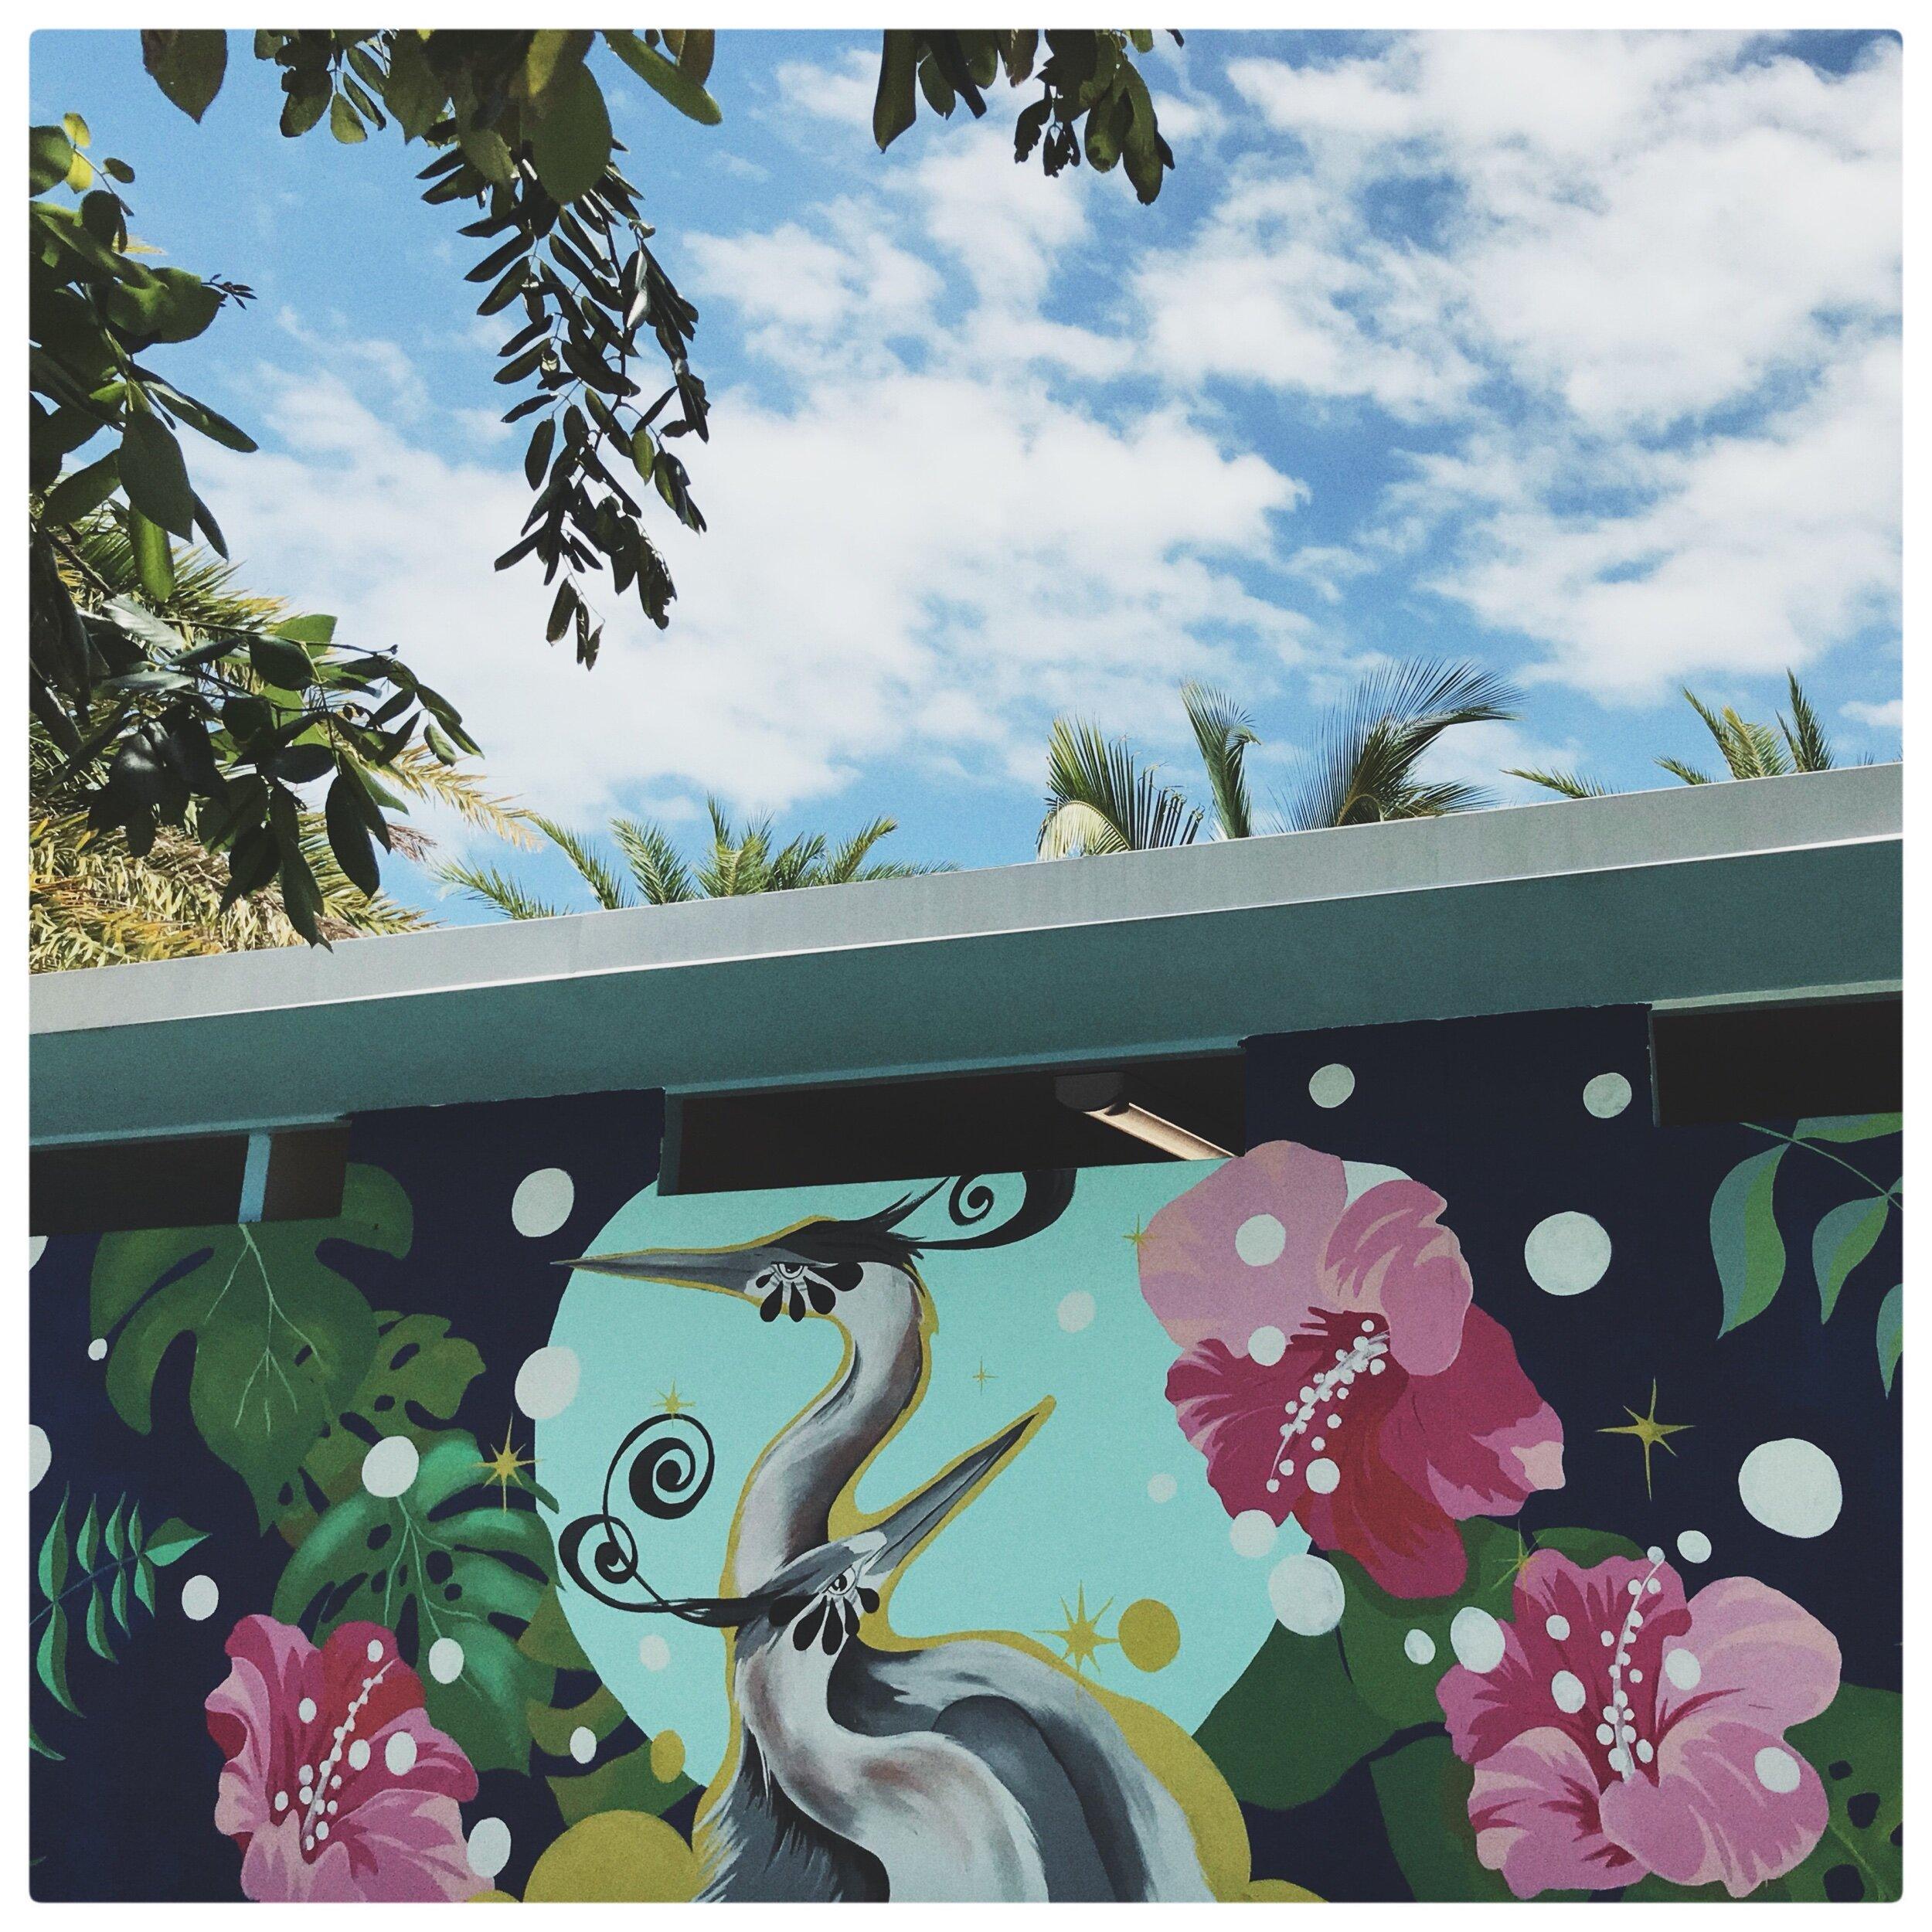 Key West Splash Park 2019